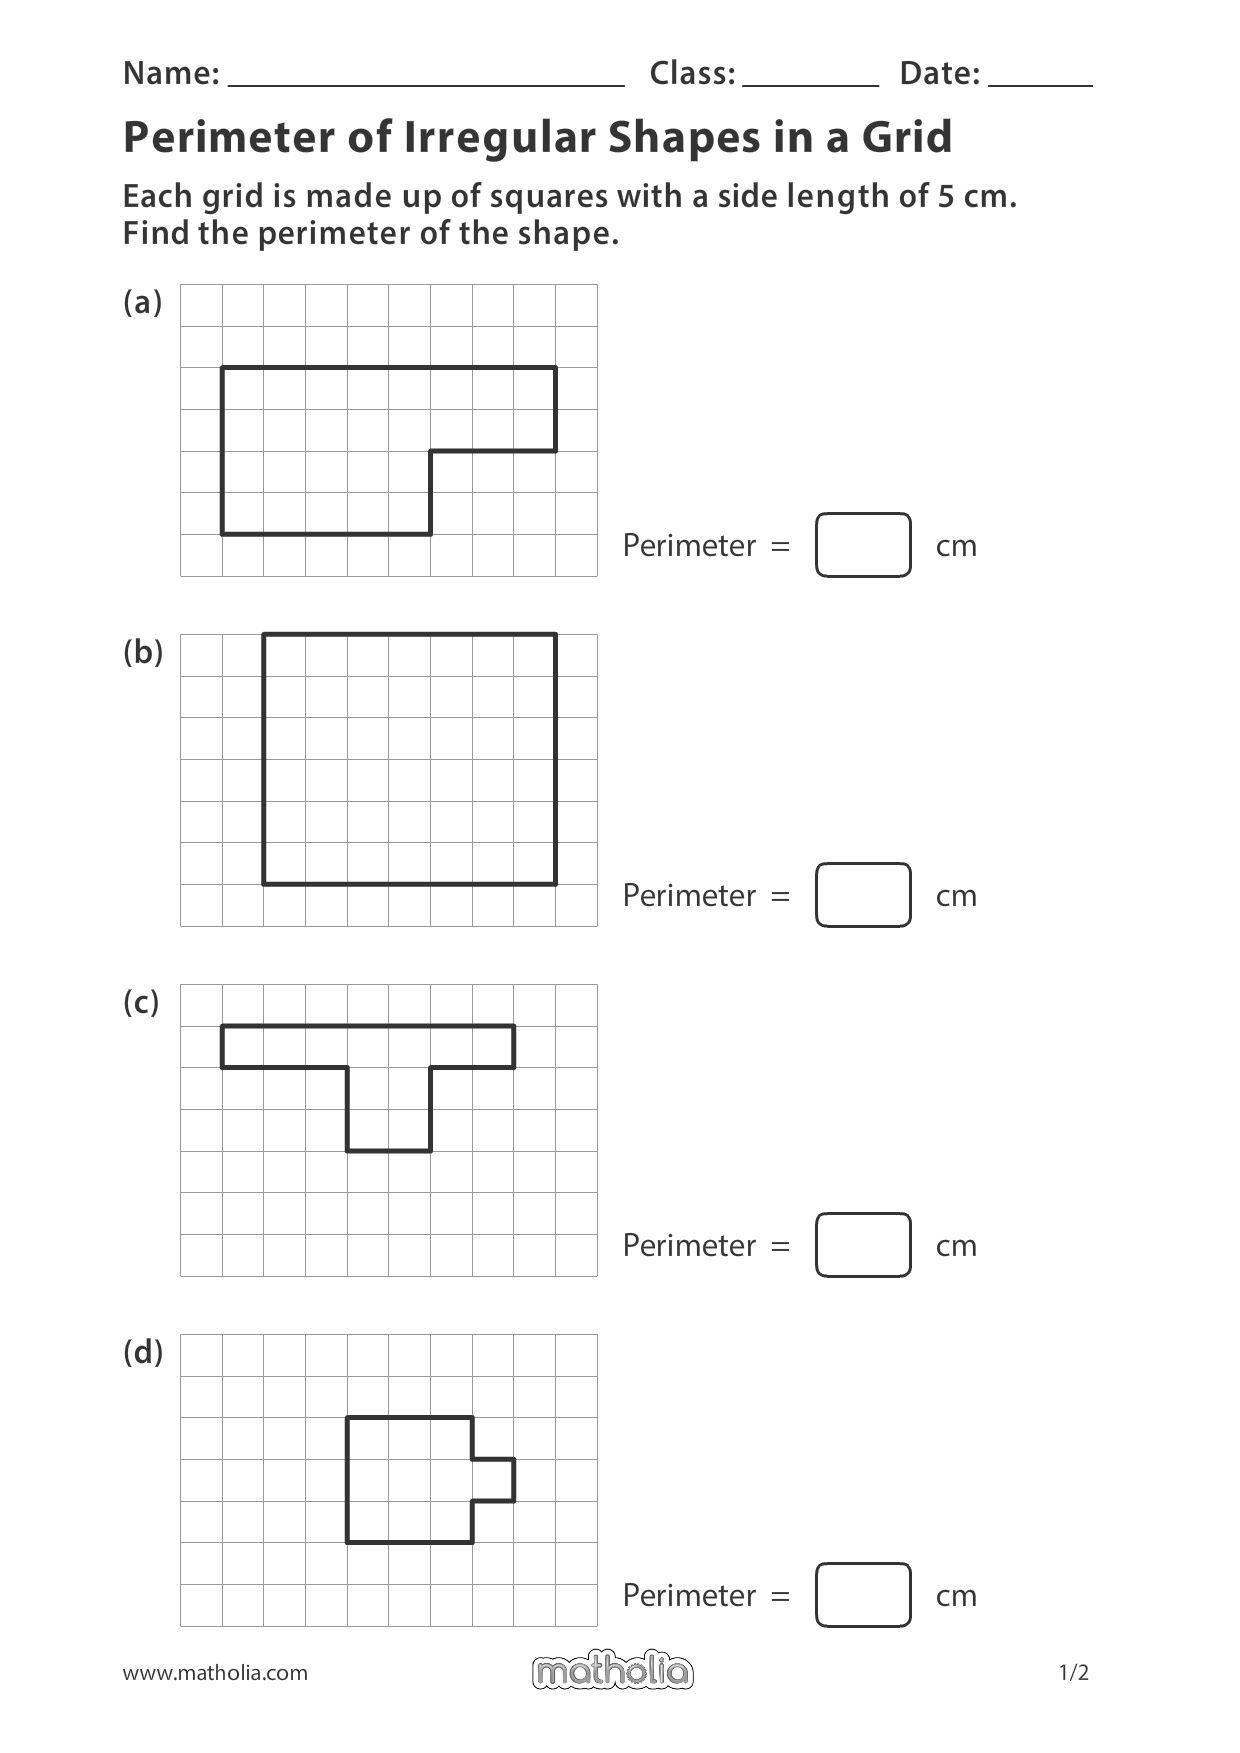 Pin On Matholia Printables Grade 3